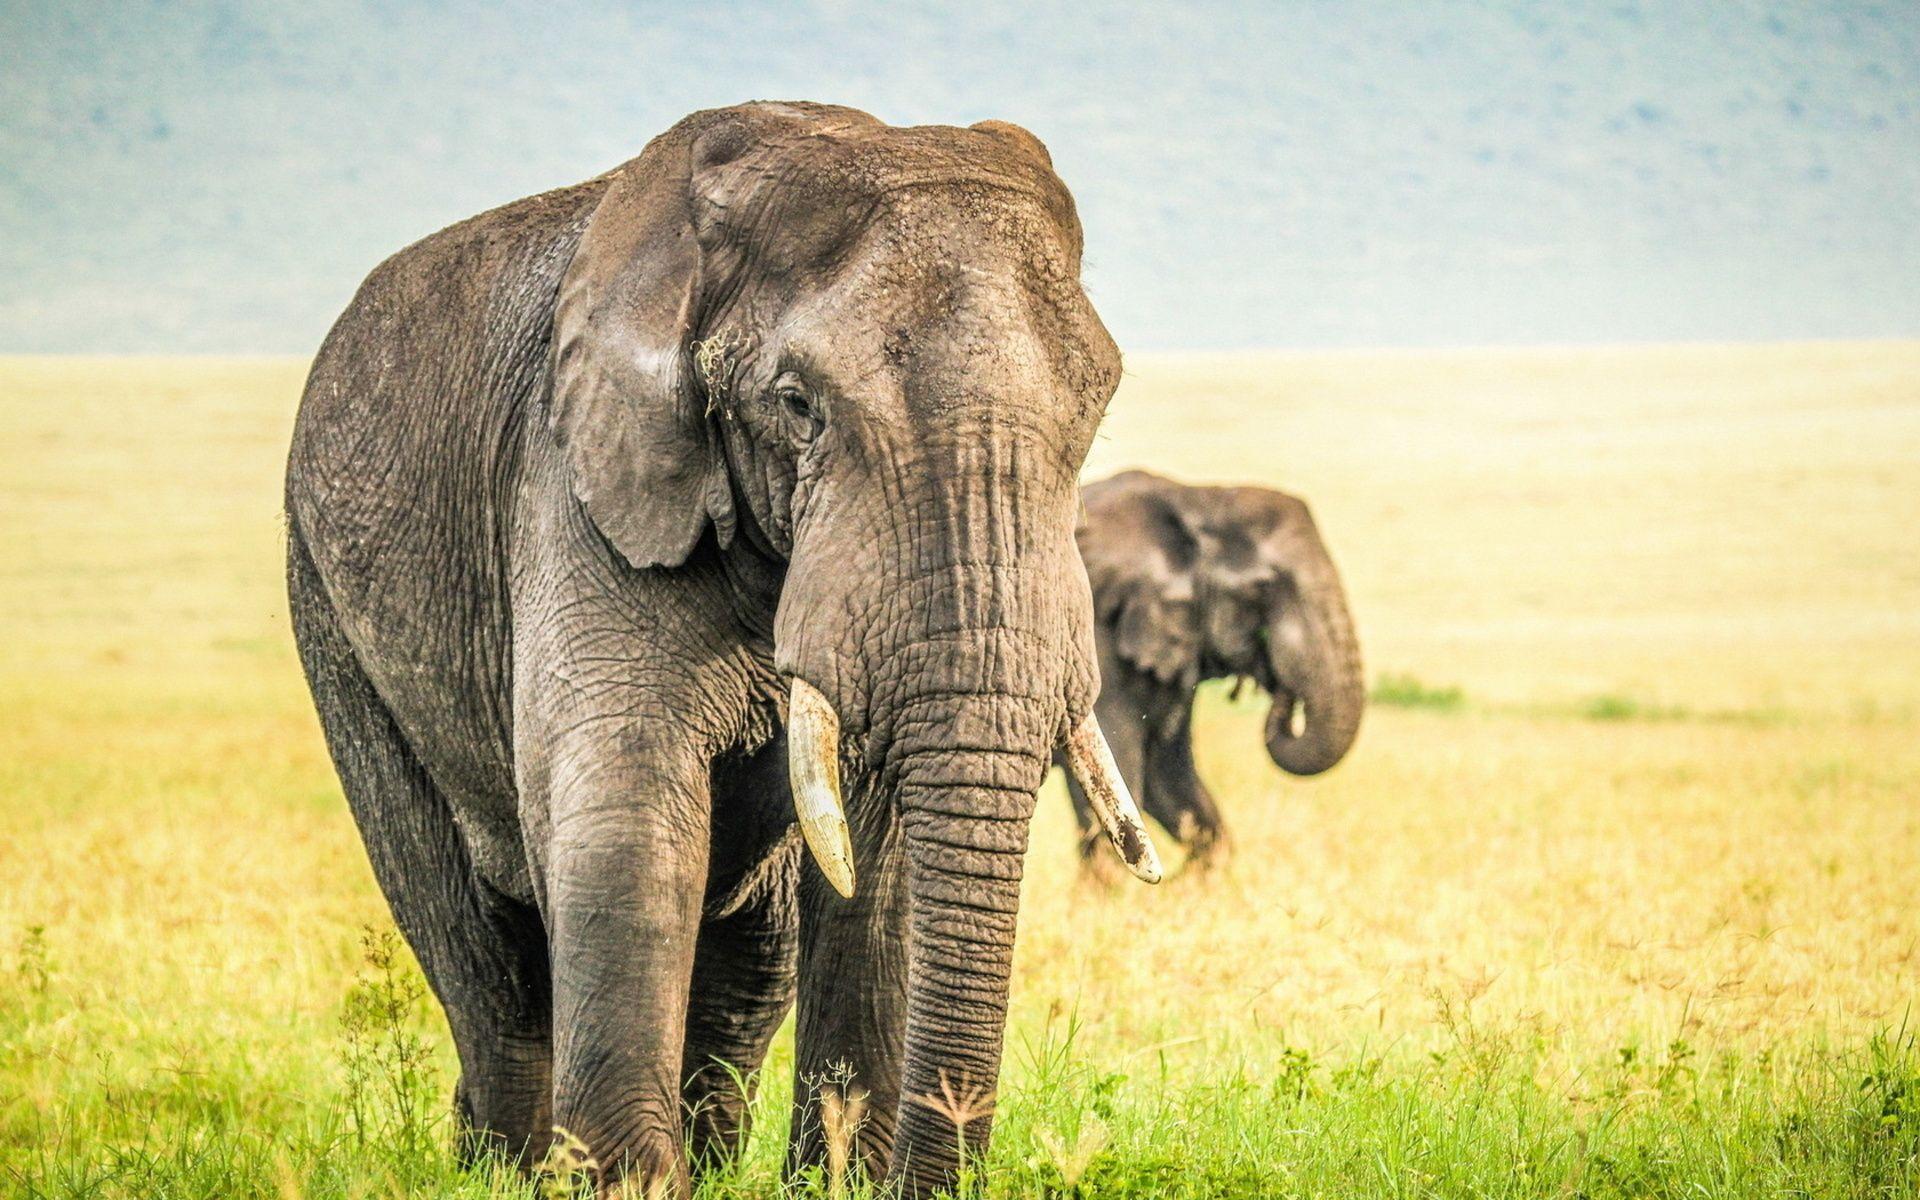 Wallpaper download elephant - Wallpaper Downloads Best Ideas About Elephant Background On Pinterest Iphone